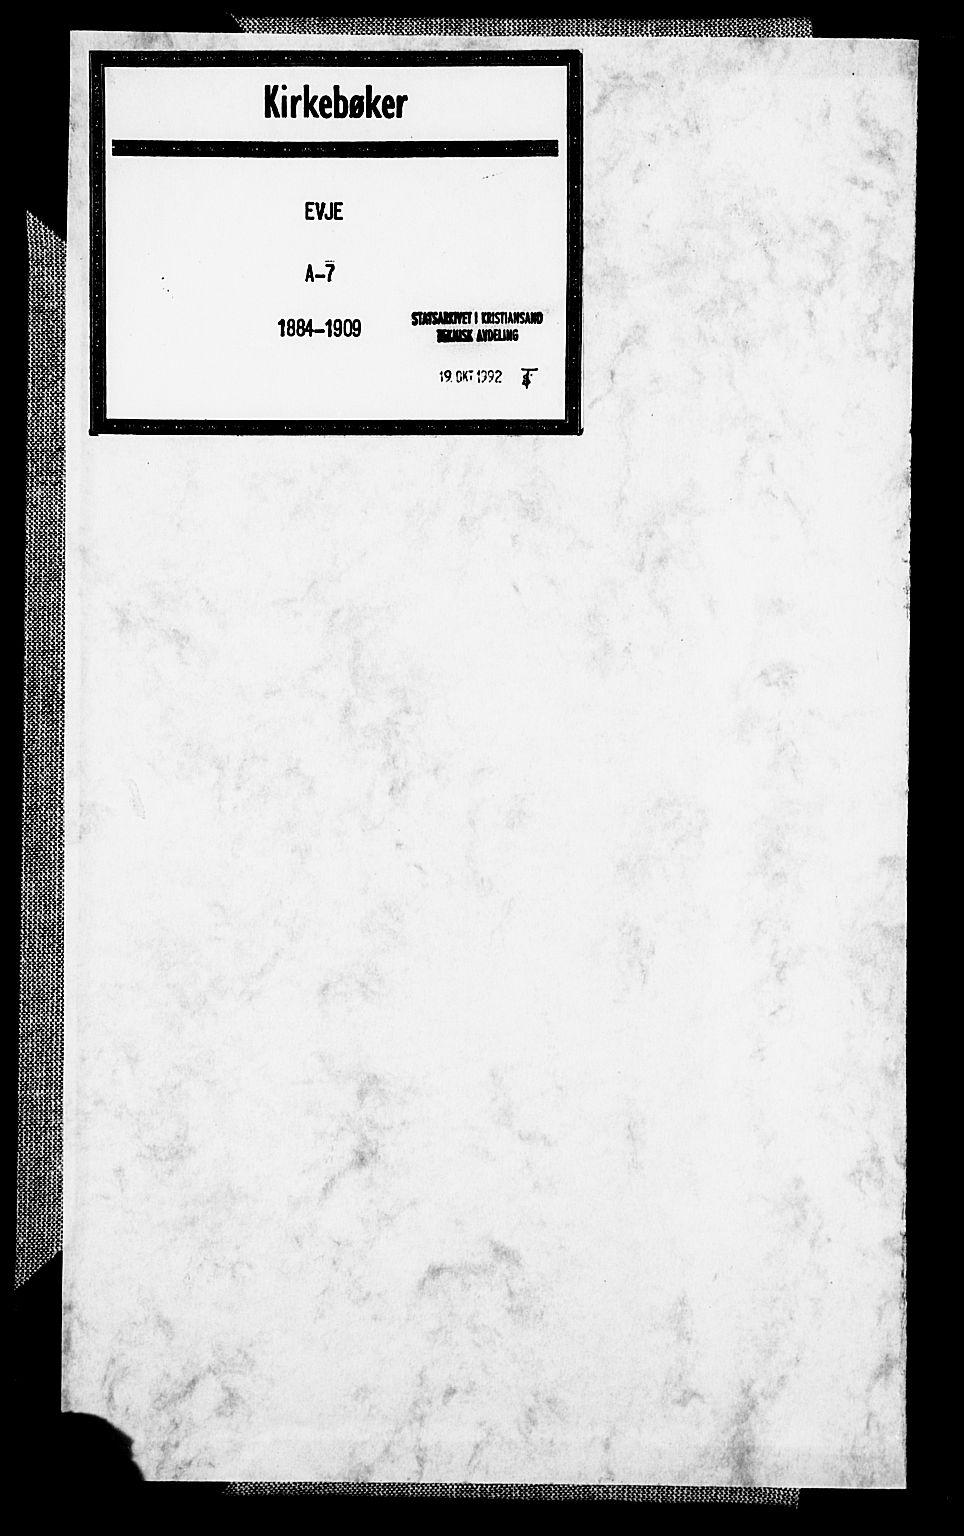 SAK, Evje sokneprestkontor, F/Fa/Faa/L0007: Ministerialbok nr. A 7, 1884-1909